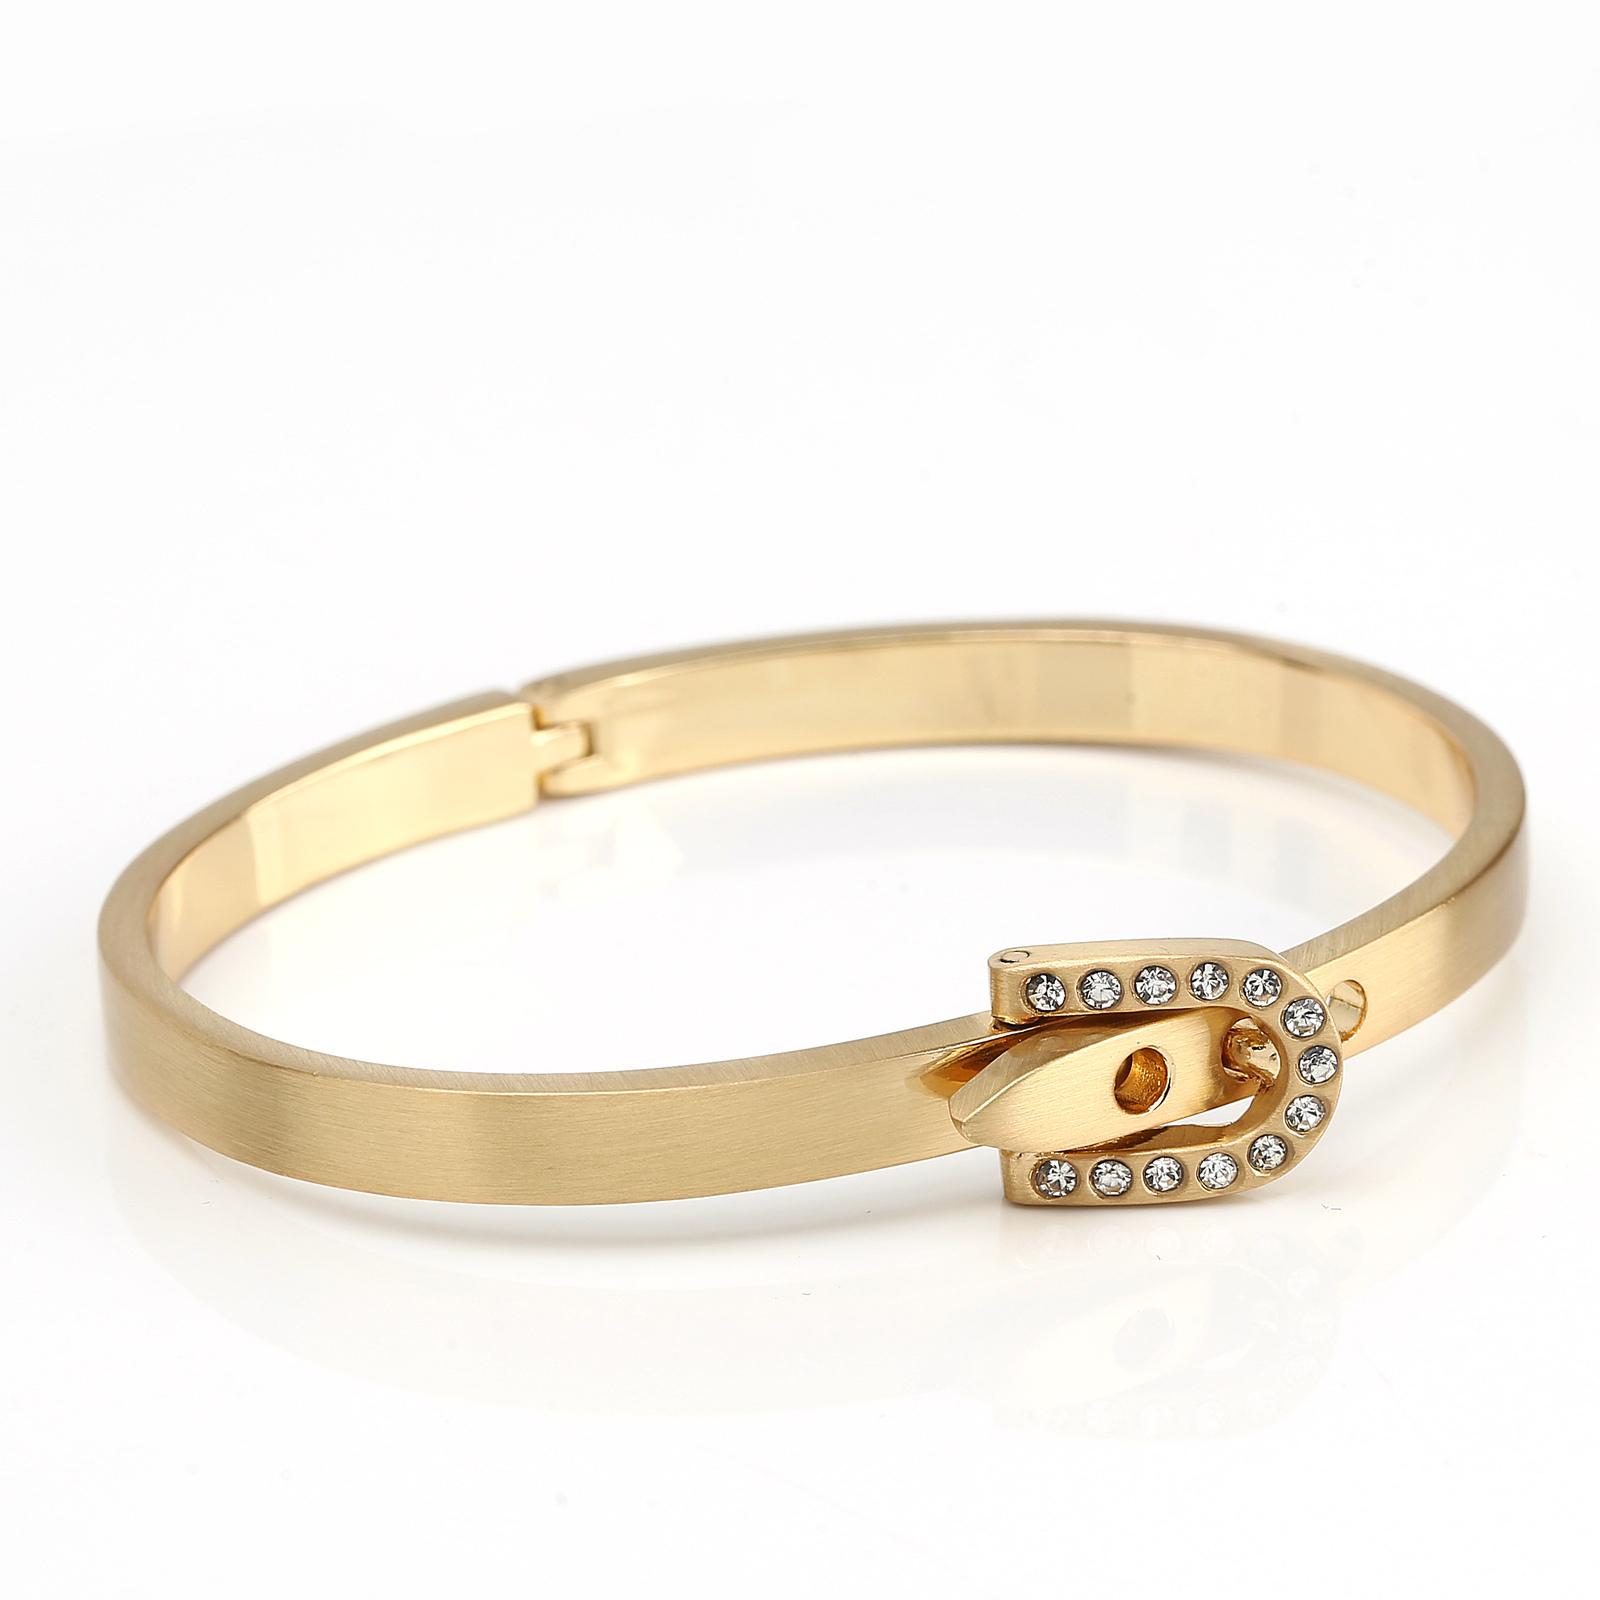 UE-Designer Gold Tone Bangle Bracelet, Buckle Clasp & Swarovski Style Crystals image 3